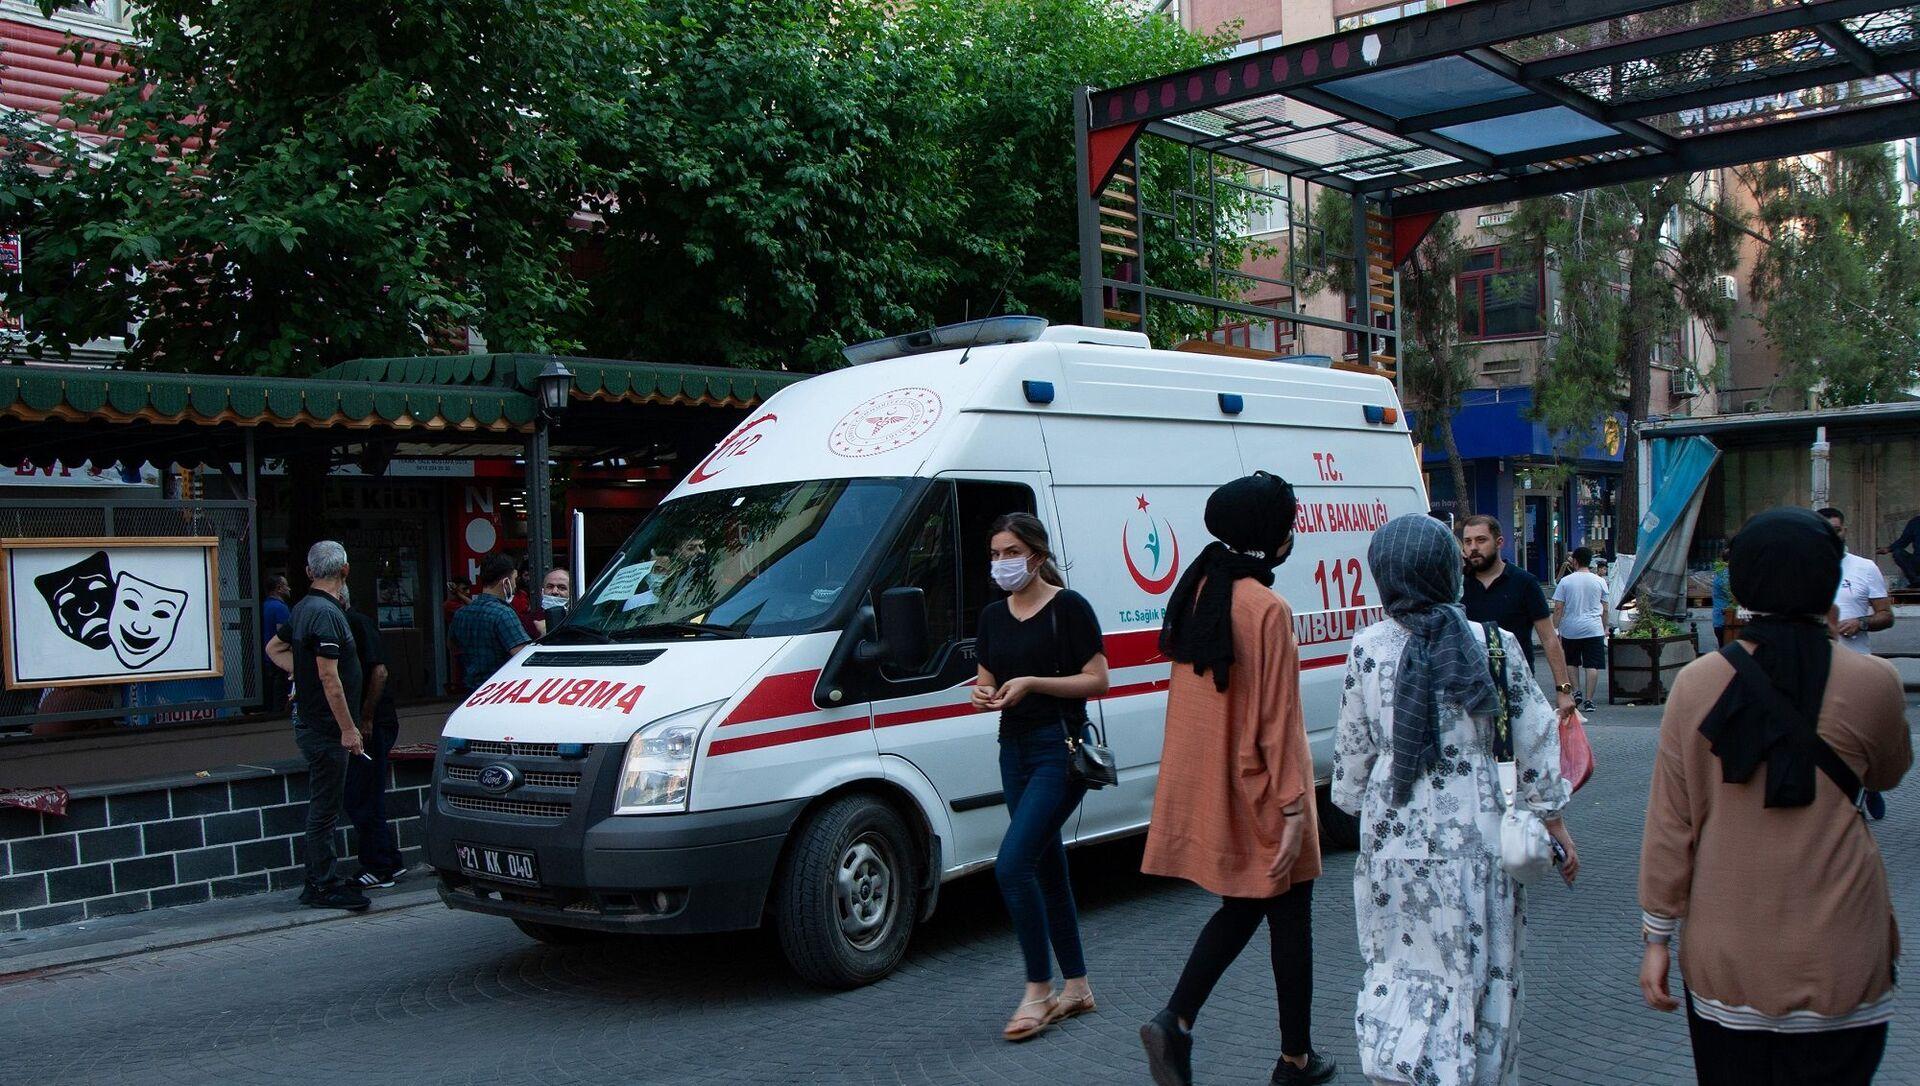 Diyarbakır - maske - koronavirüs - ambulans  - Sputnik Türkiye, 1920, 28.07.2021